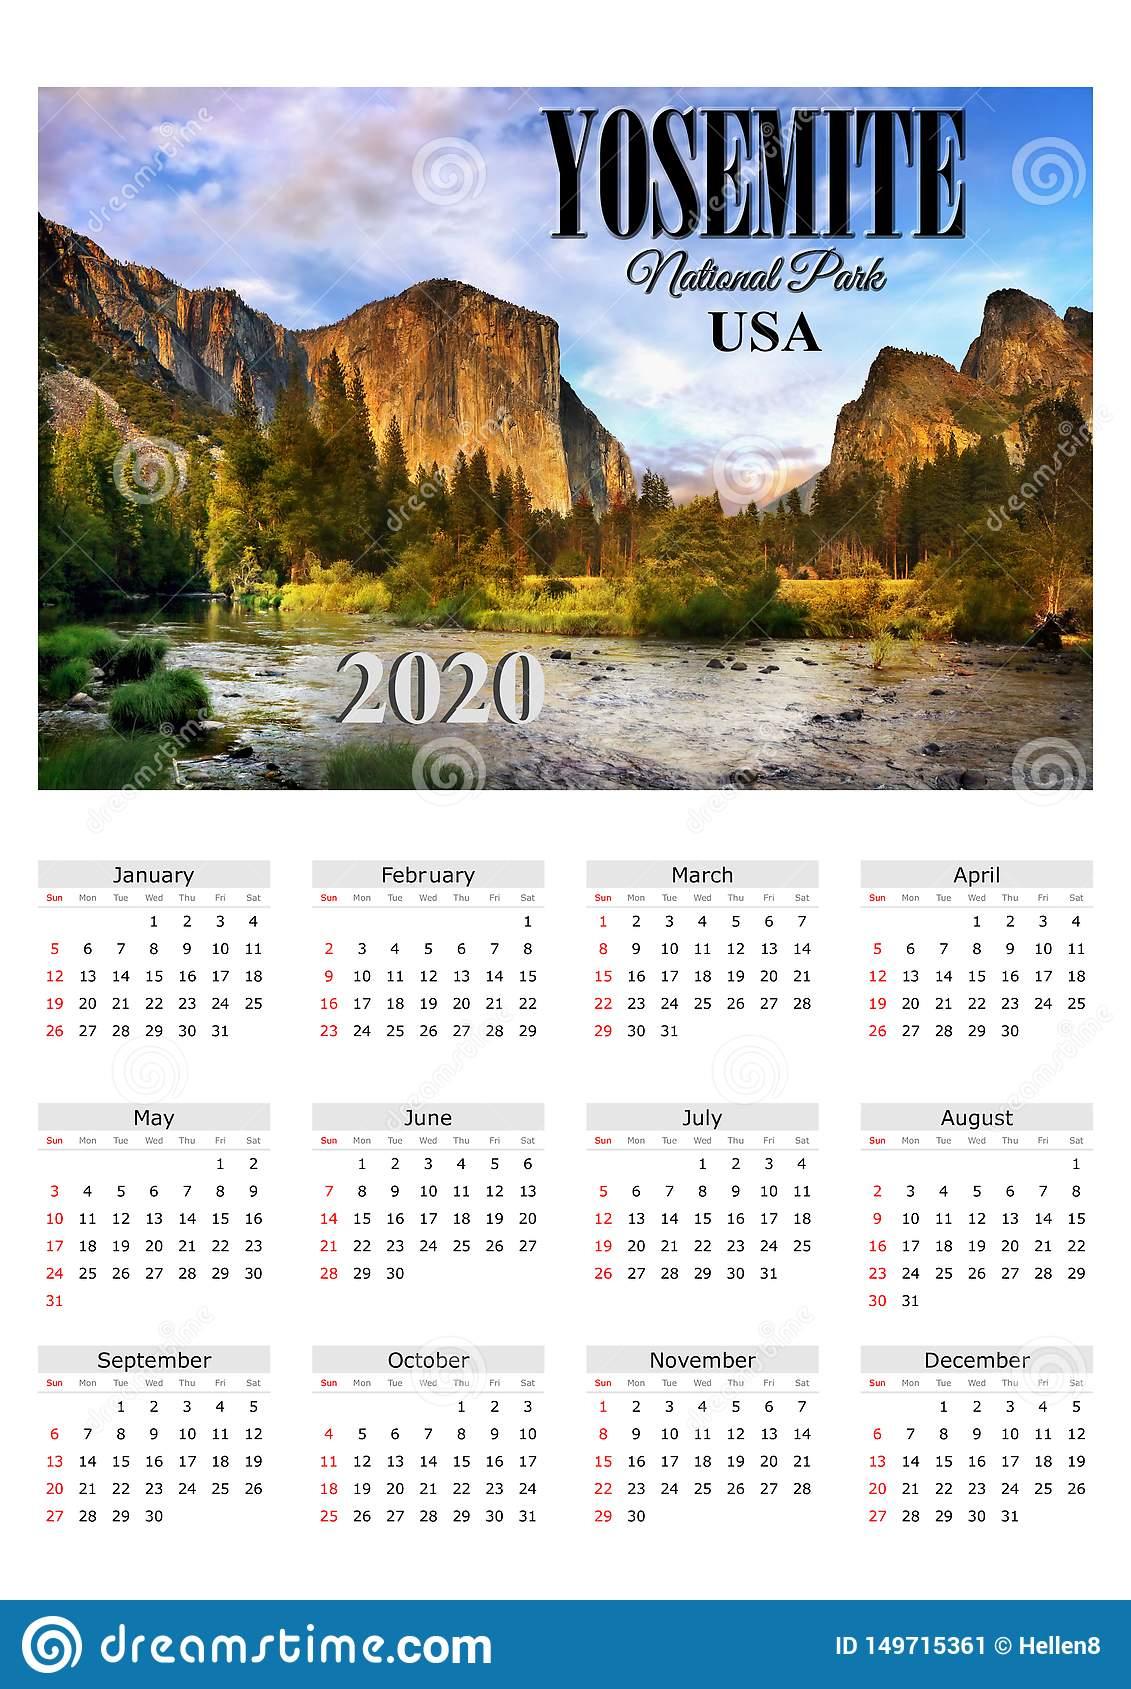 Calendar Poster 2020 Yosemite Np, Usa Stock Image - Image Of